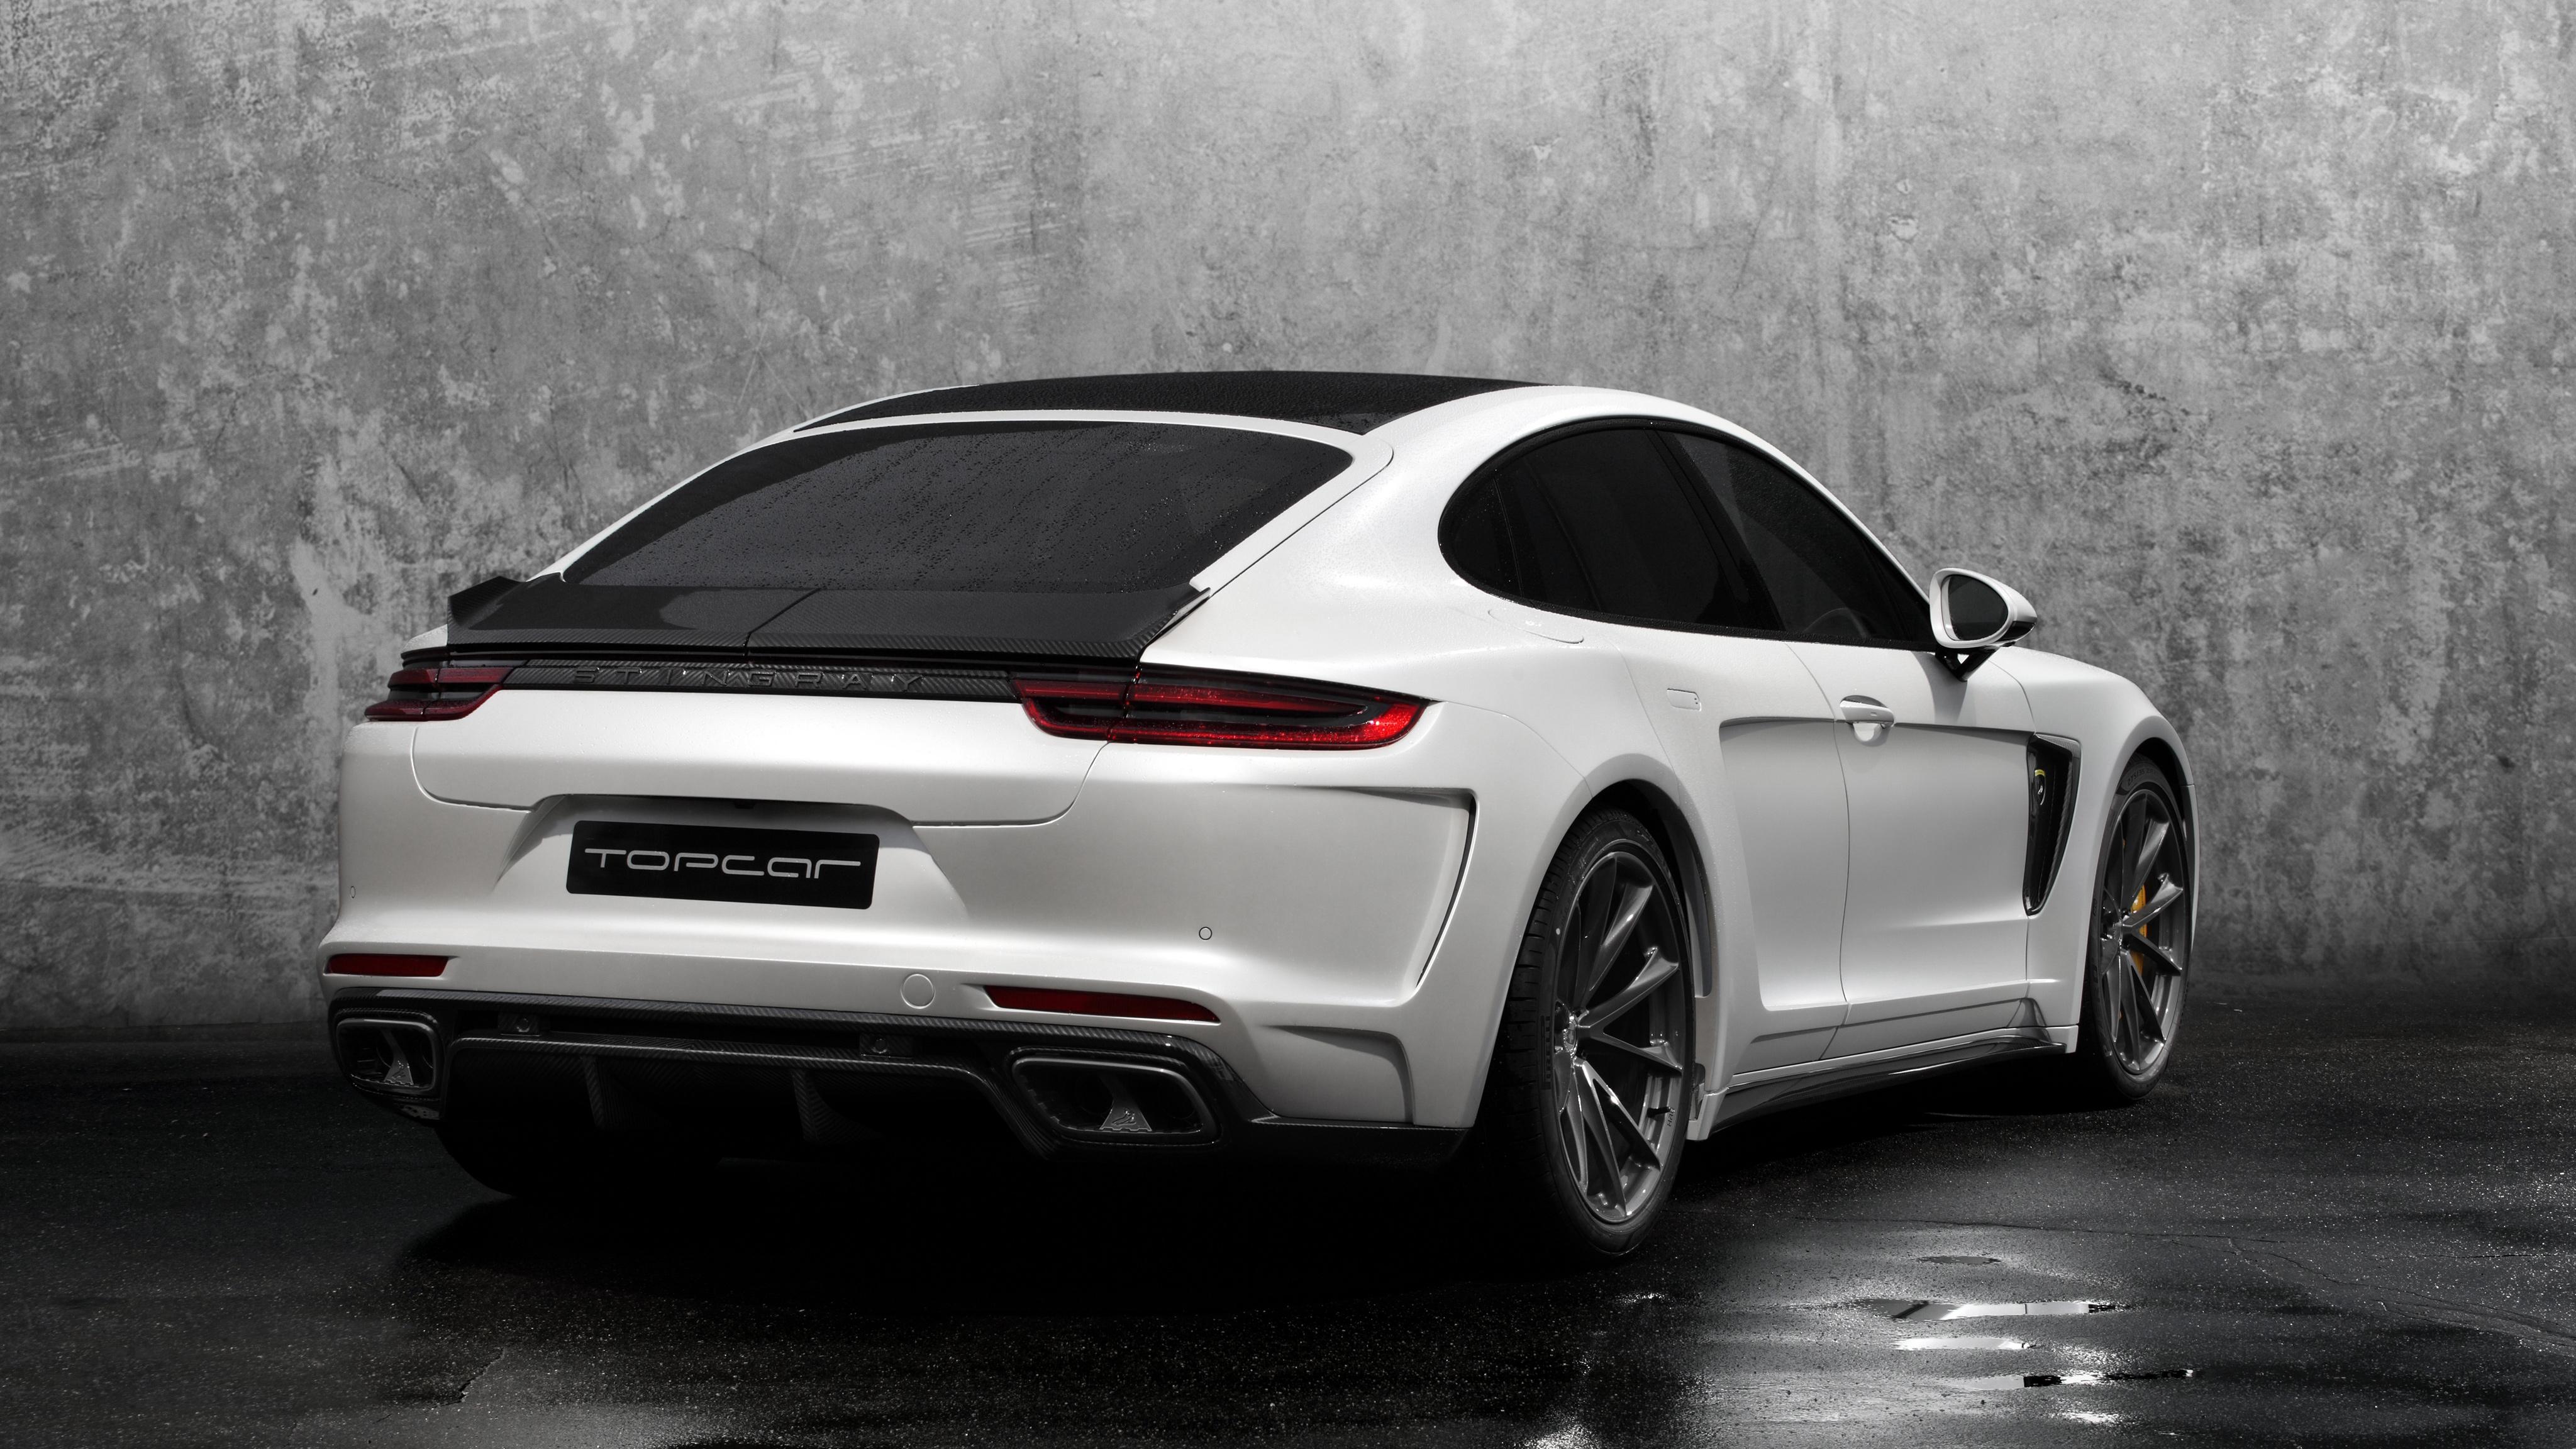 2017 Topcar Porsche Panamera Stingray Gtr 2 Wallpaper Hd